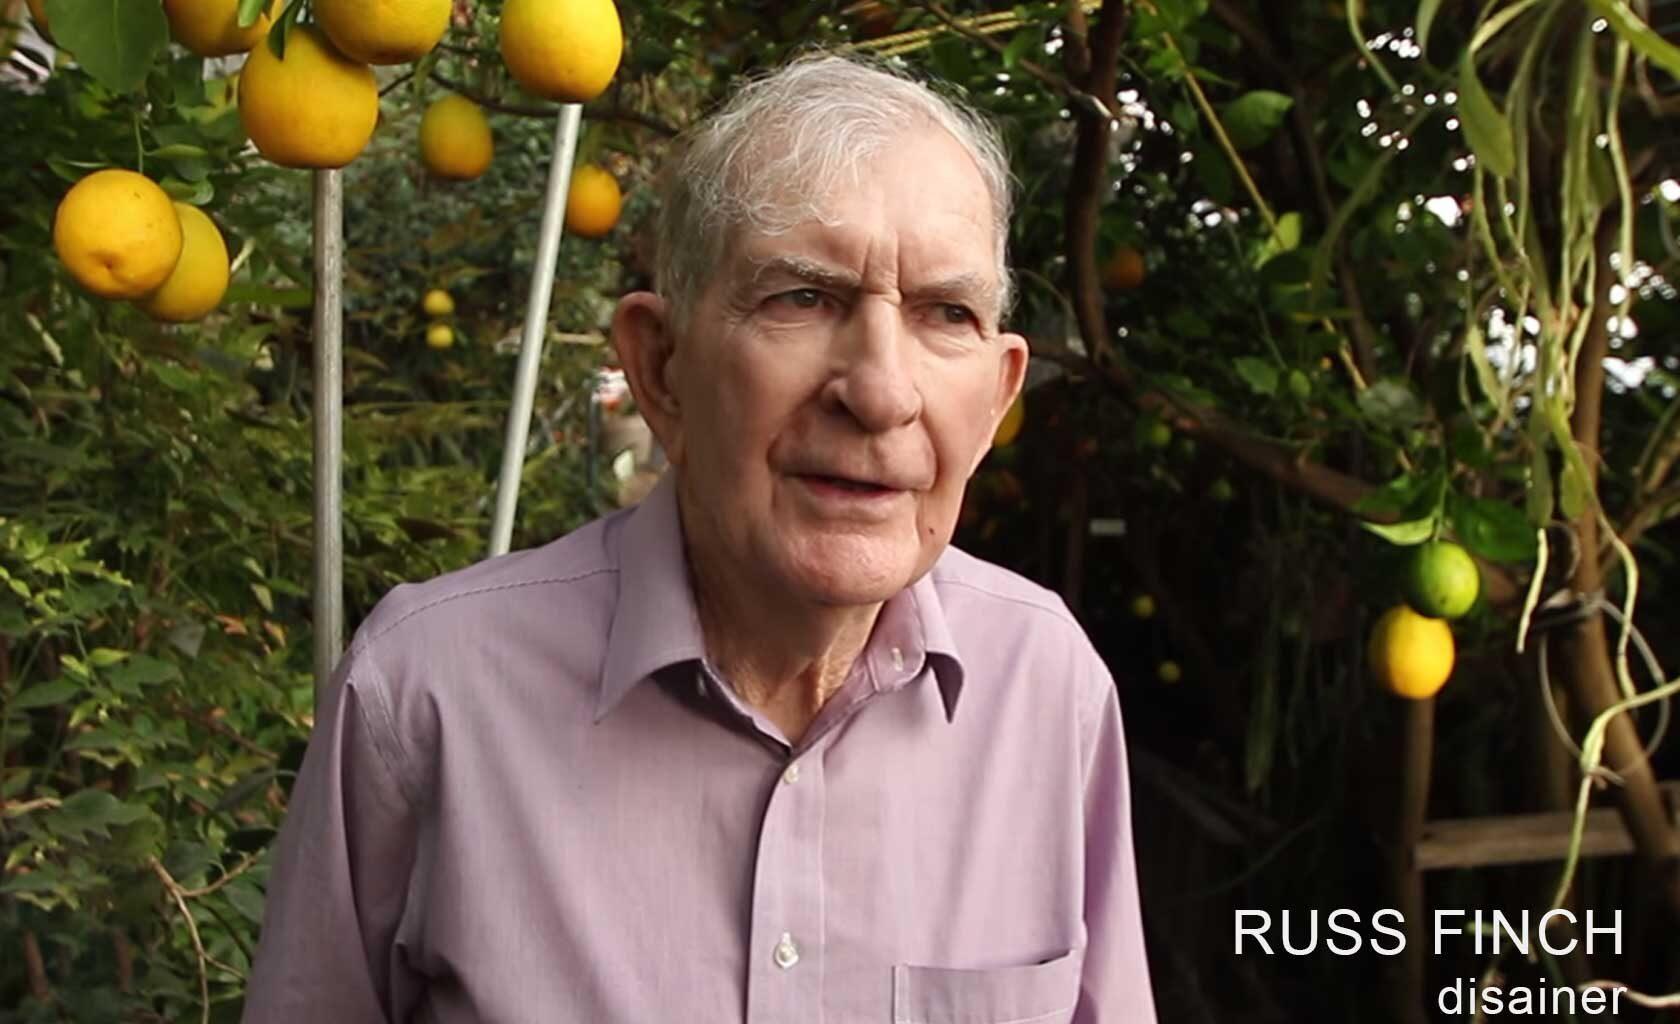 Russ Finch - kasvuhoone disainer